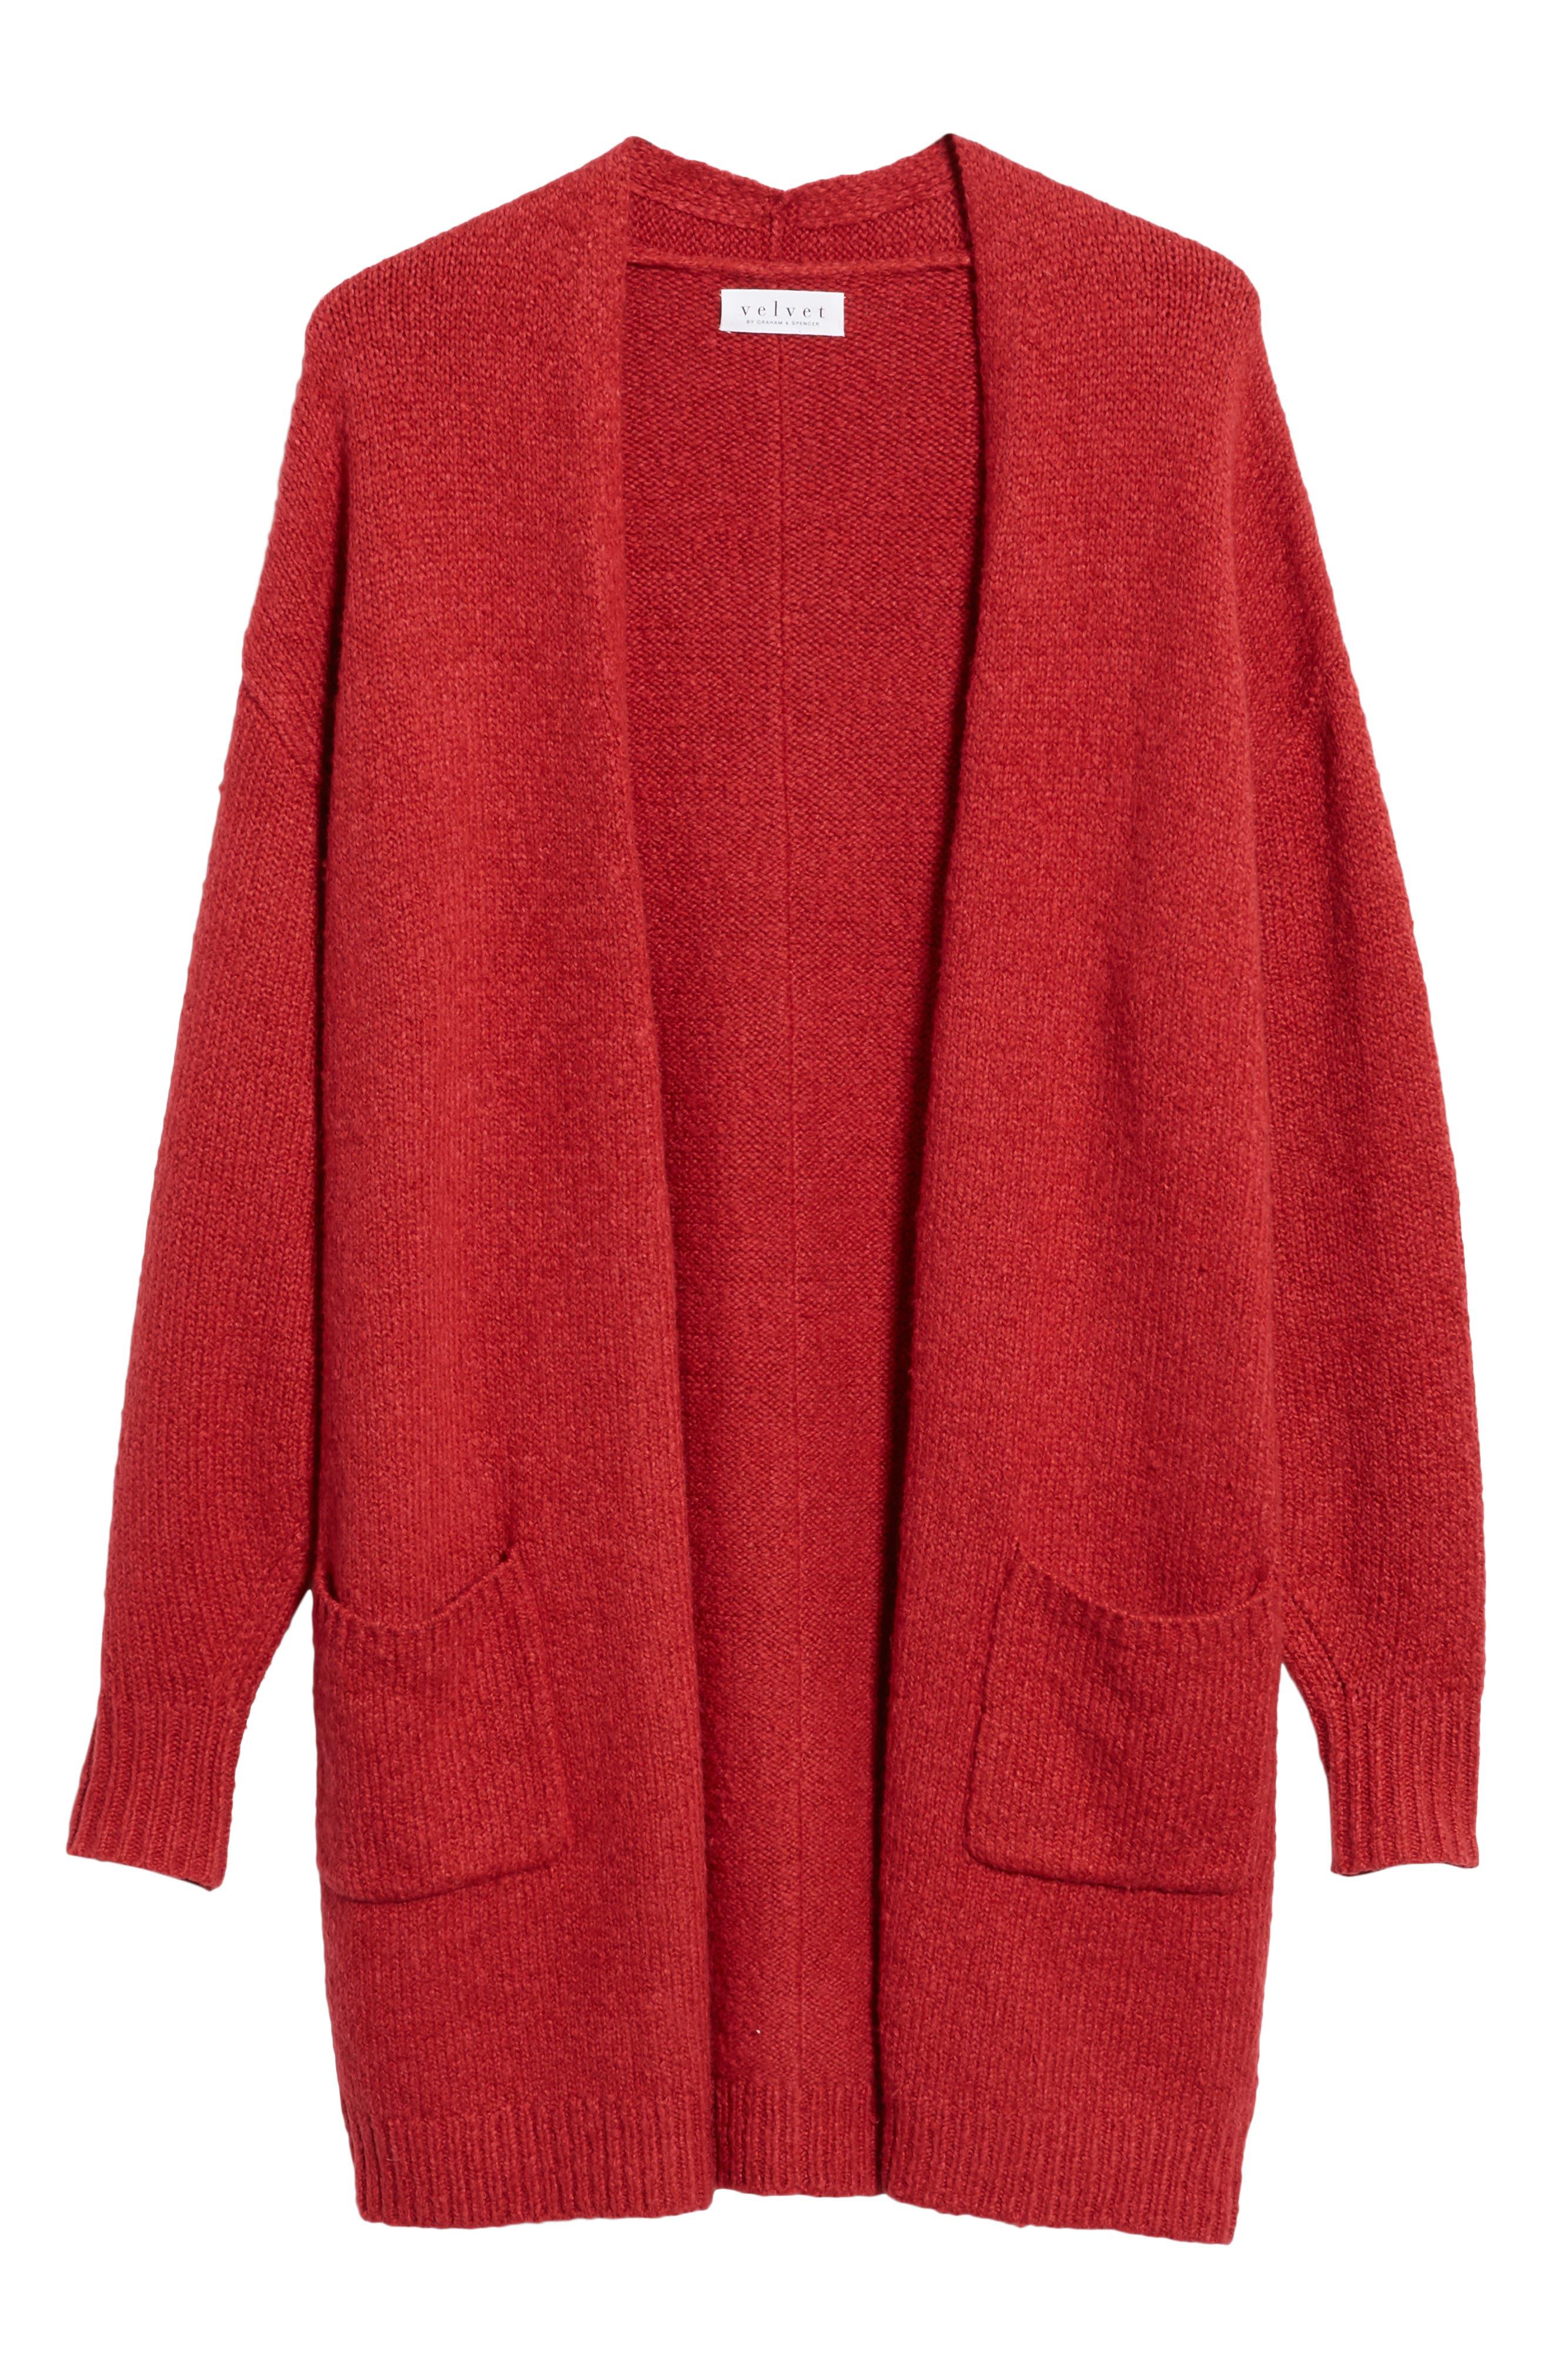 Cotton Blend Cardigan,                             Alternate thumbnail 6, color,                             RED